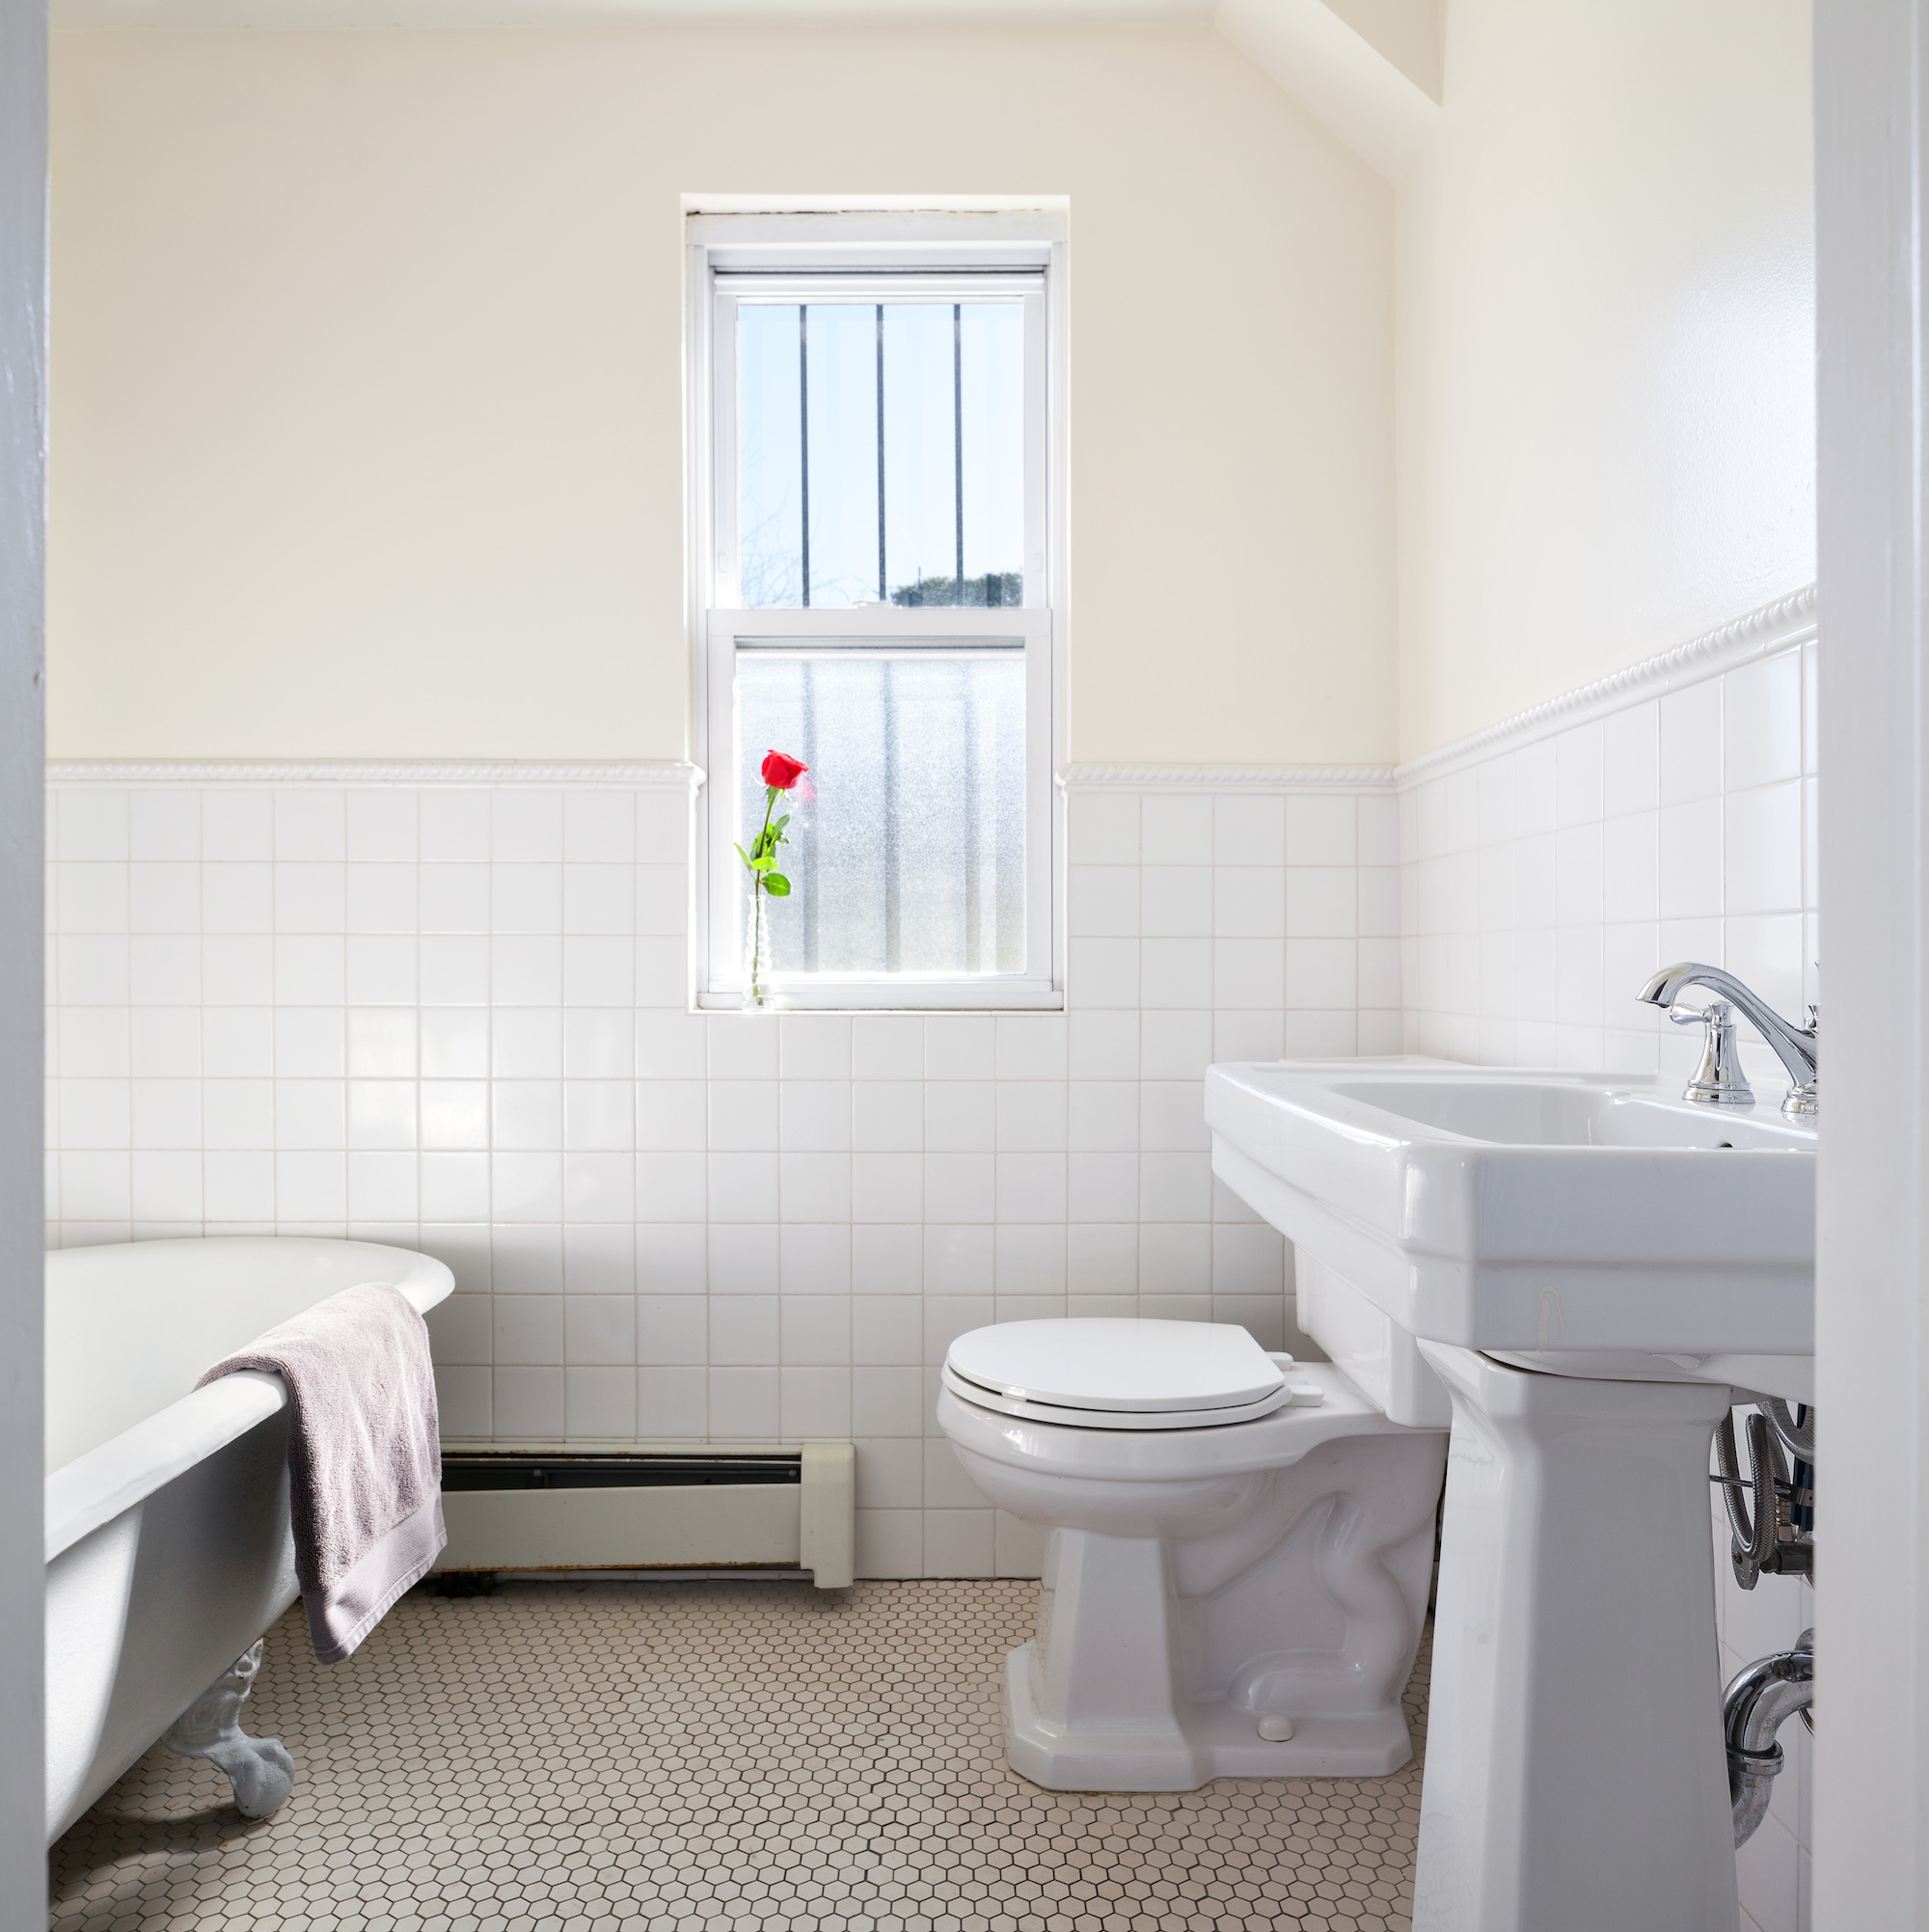 136 30th Street, bathroom